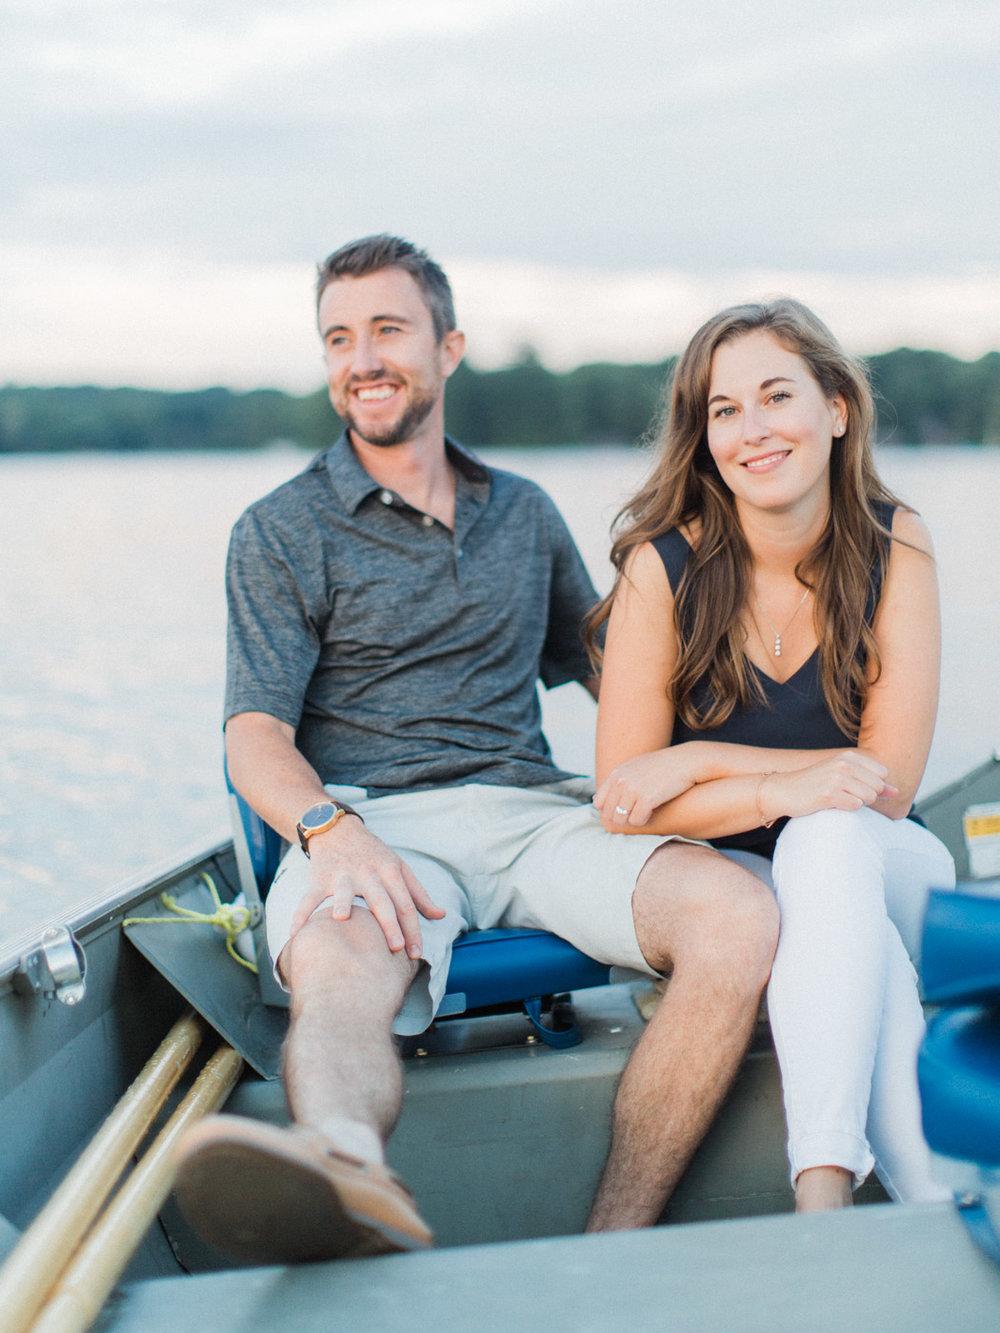 muskoka-wedding-photographer-adventurous-couples-engagement-session-lake-86.jpg